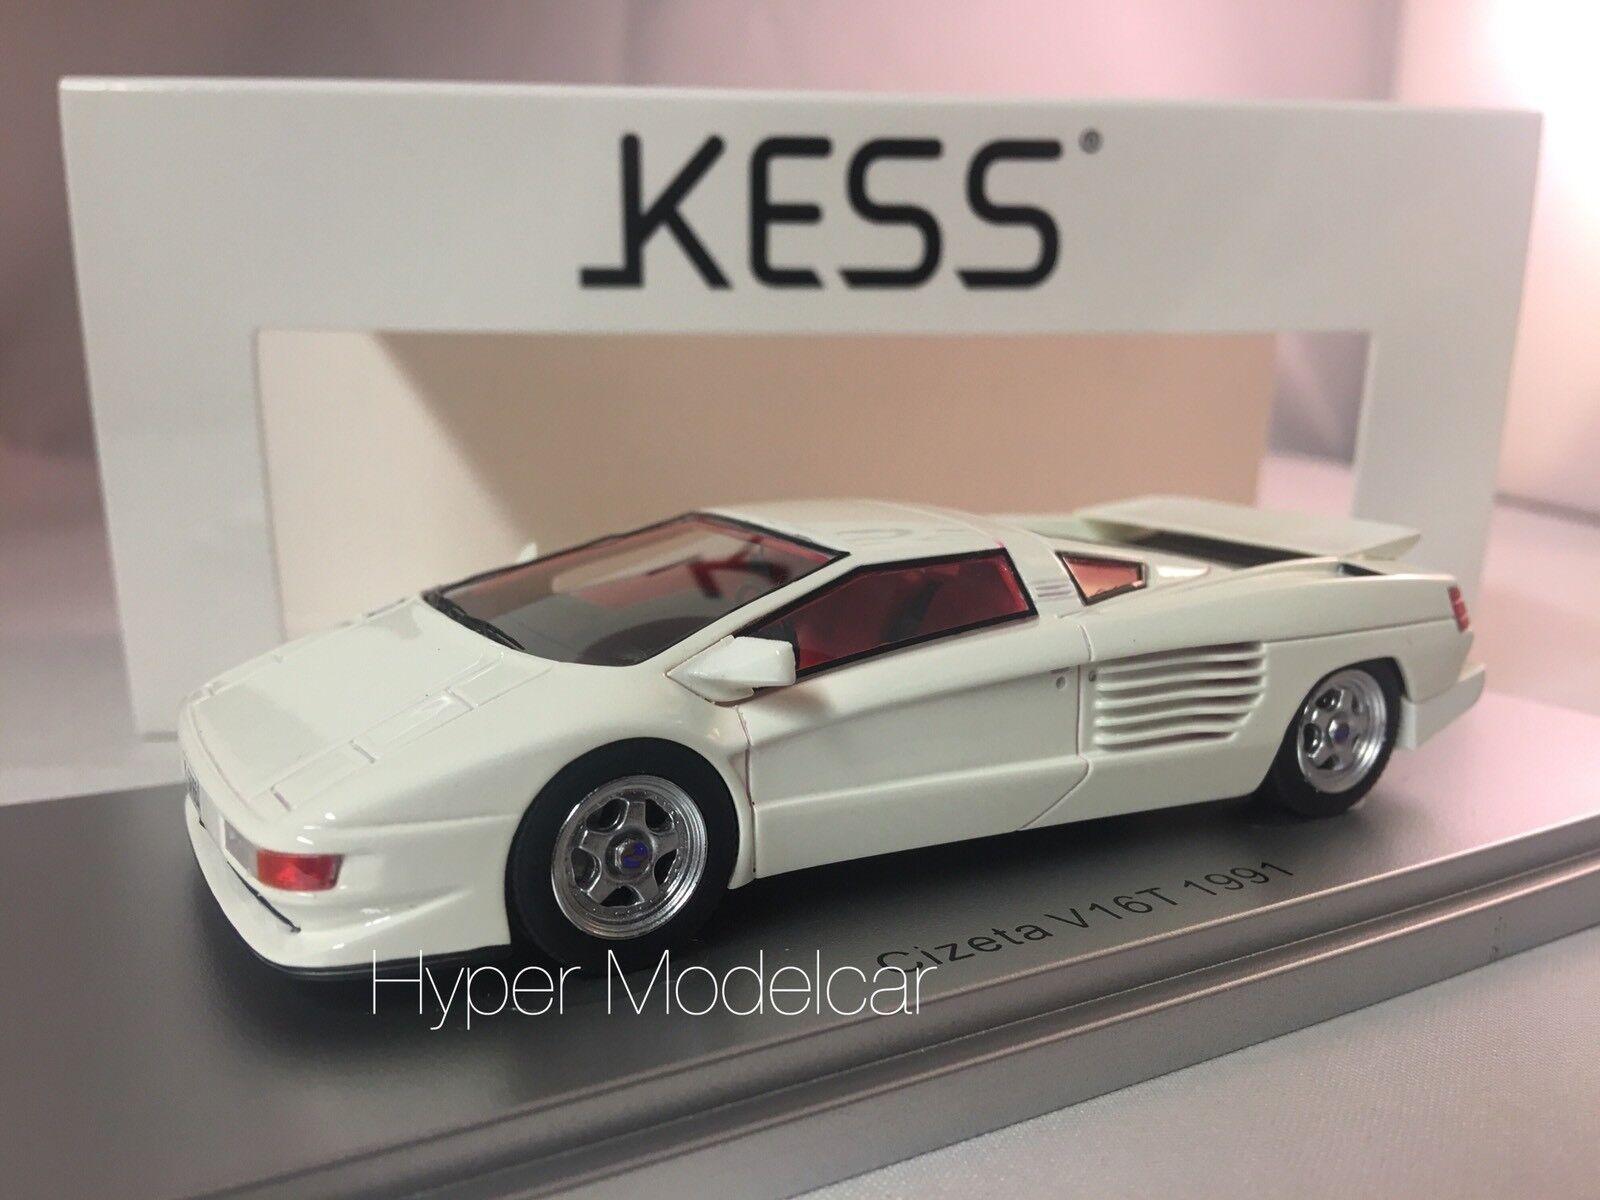 KESS MODEL 1 43 Cizeta V16T 6,4 16cil 64v 1991 blanc Art. KE43048001